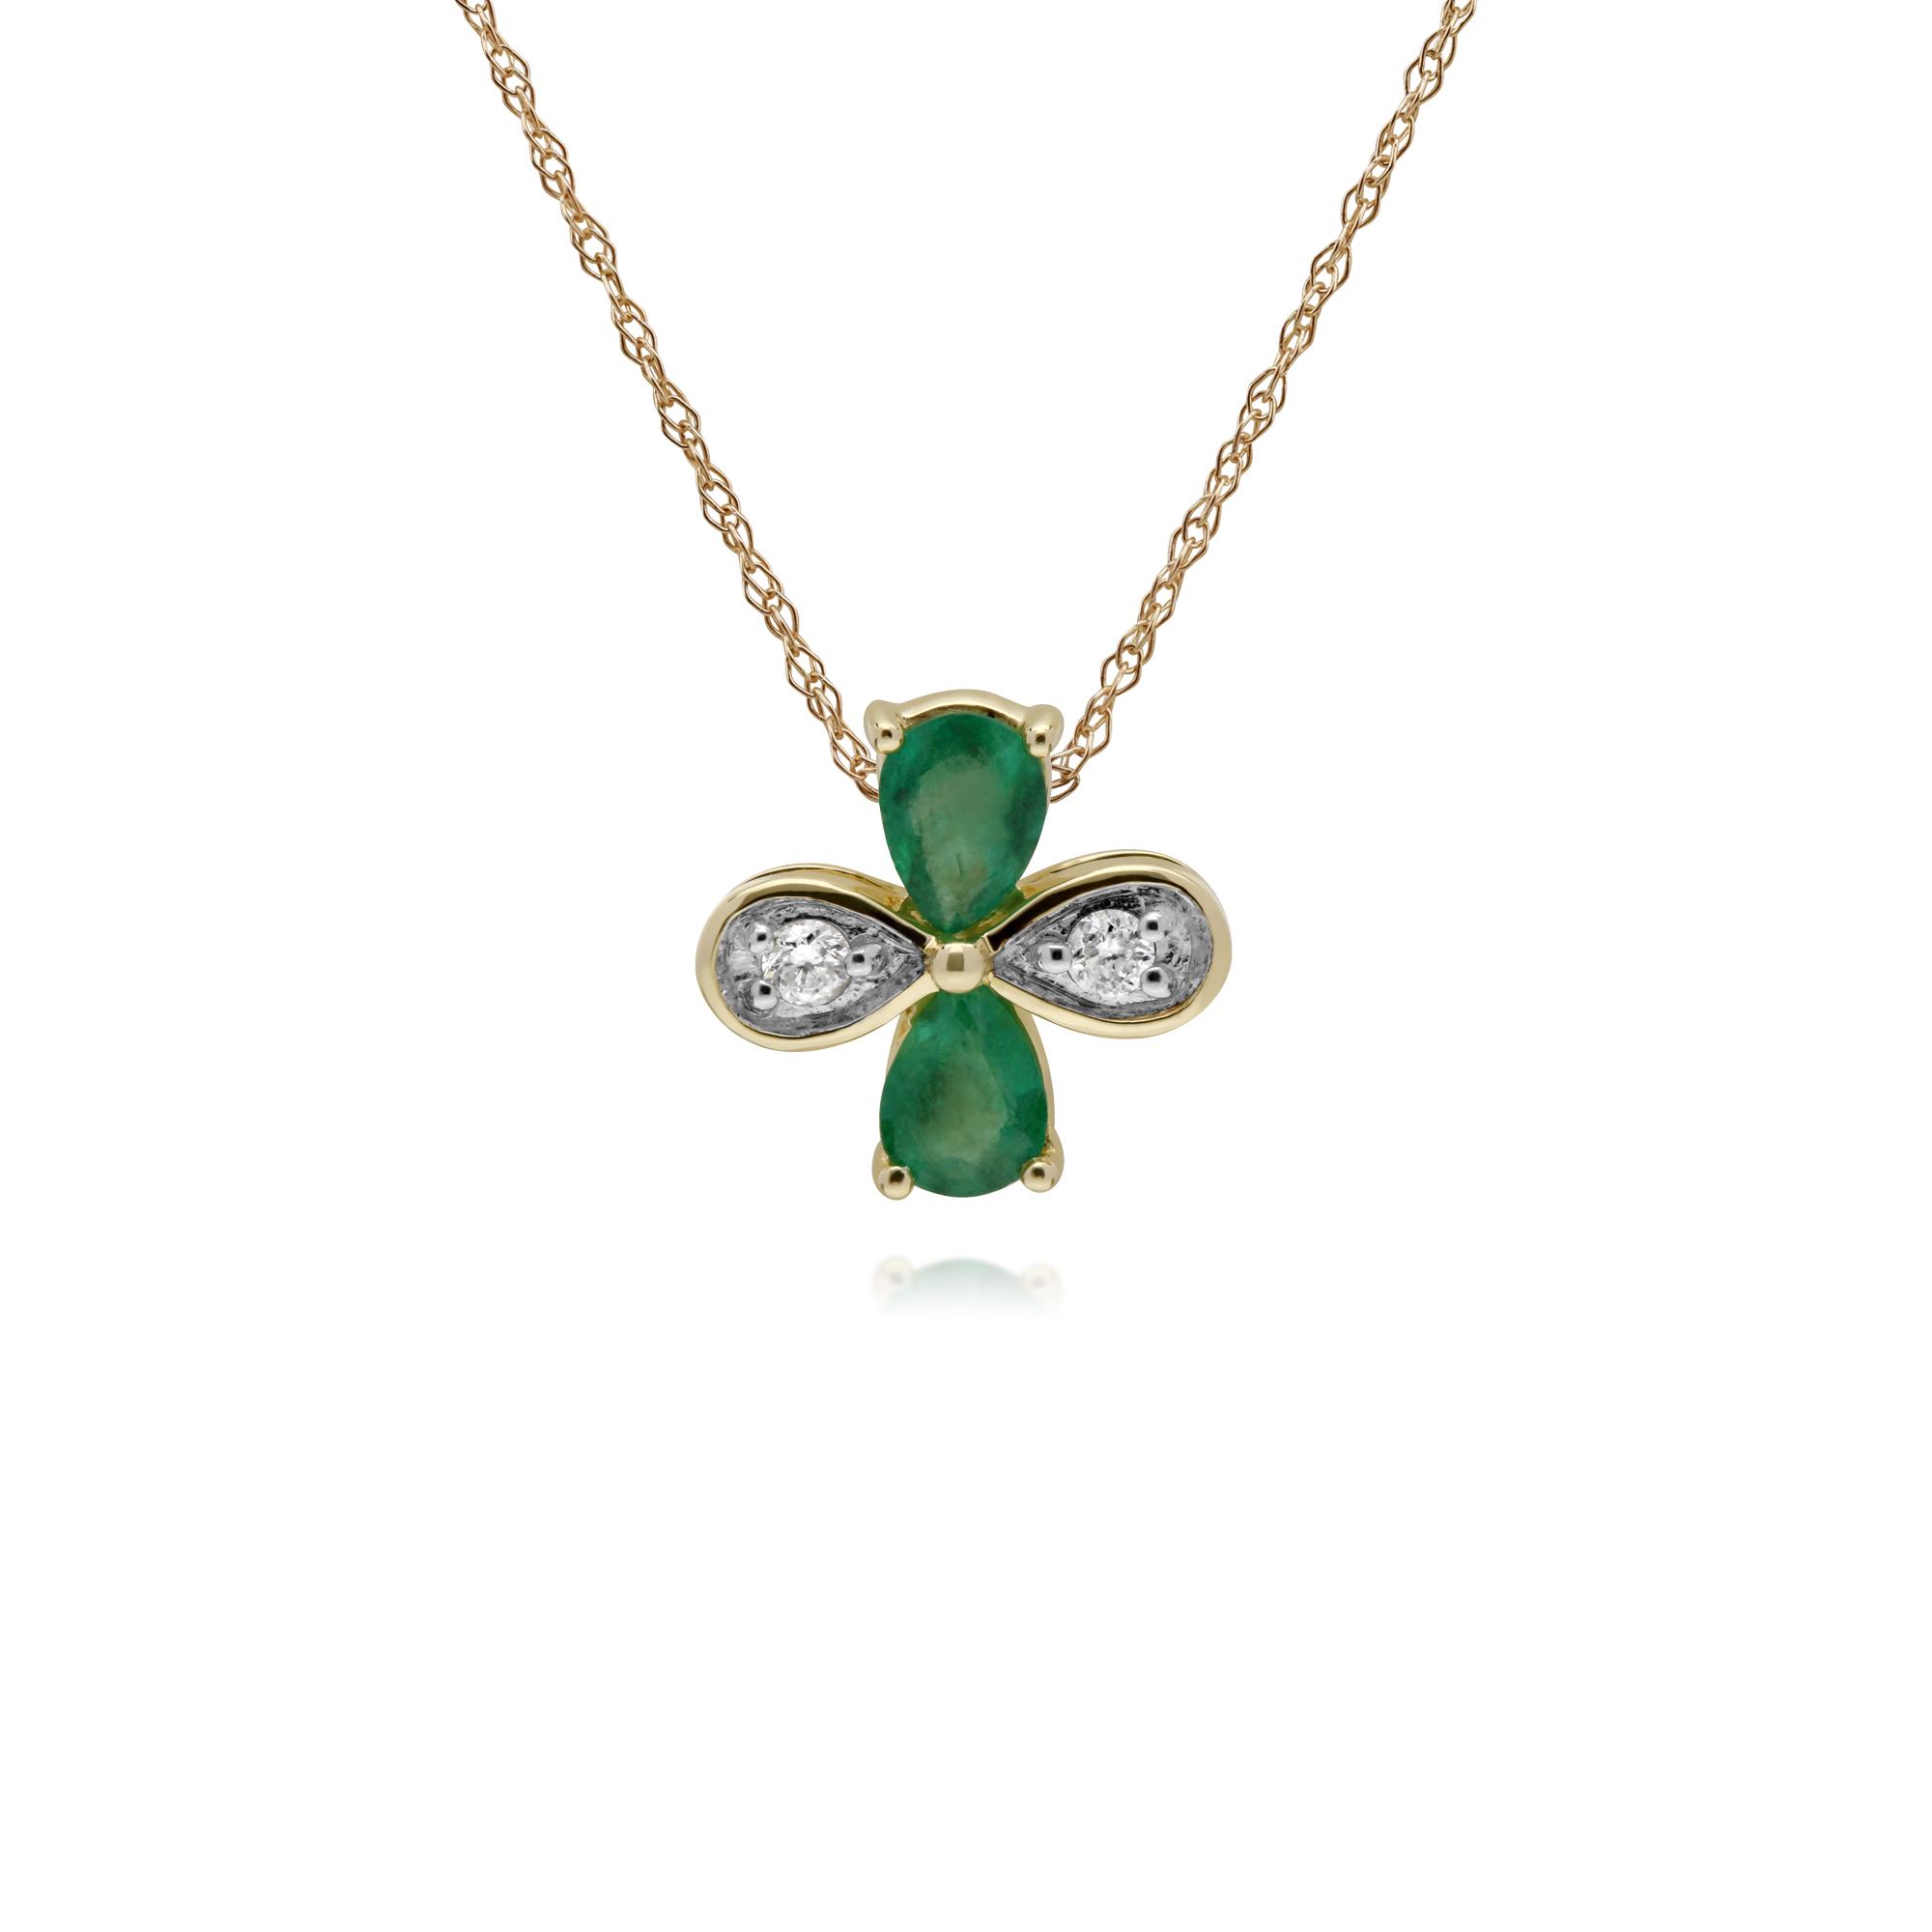 Gemondo 9ct Yellow gold Emerald & Diamond Floral Pendant on 45cm Chain